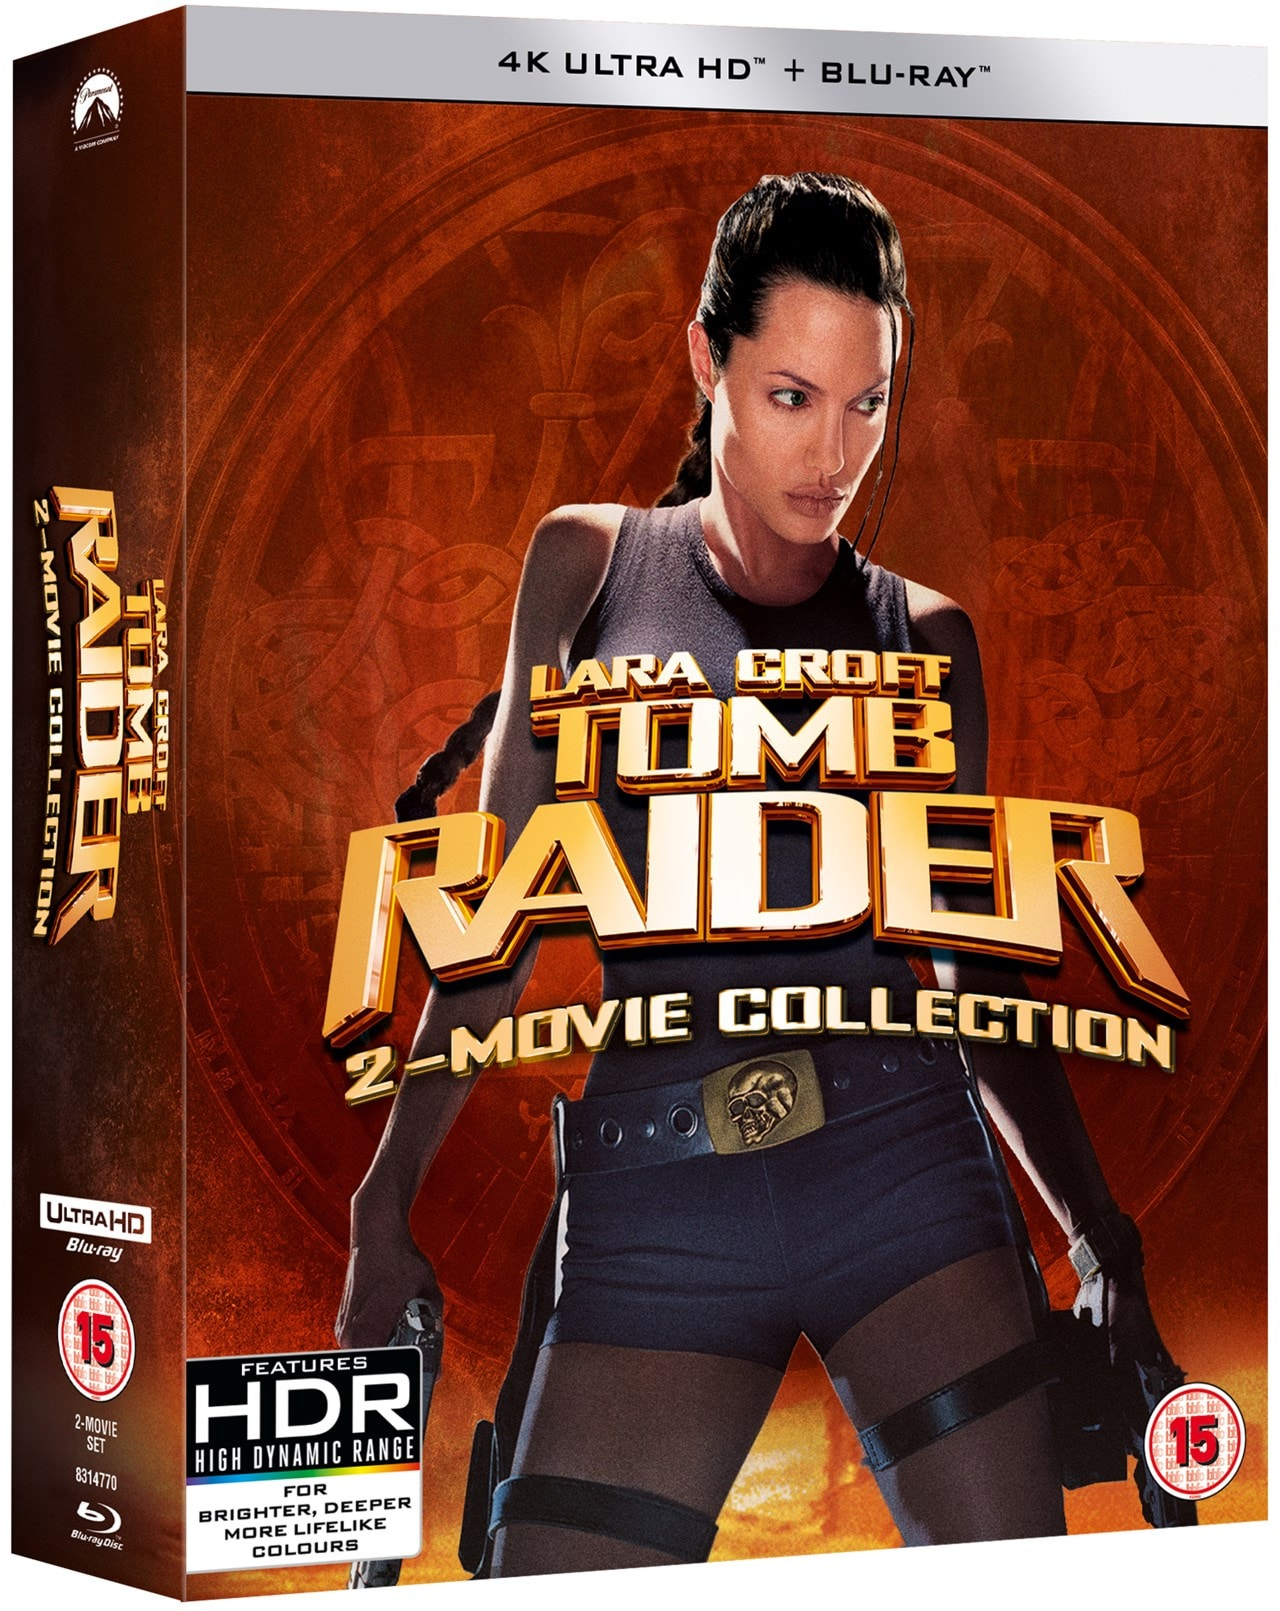 Lara Croft - Tomb Raider: 2-movie Collection - 2